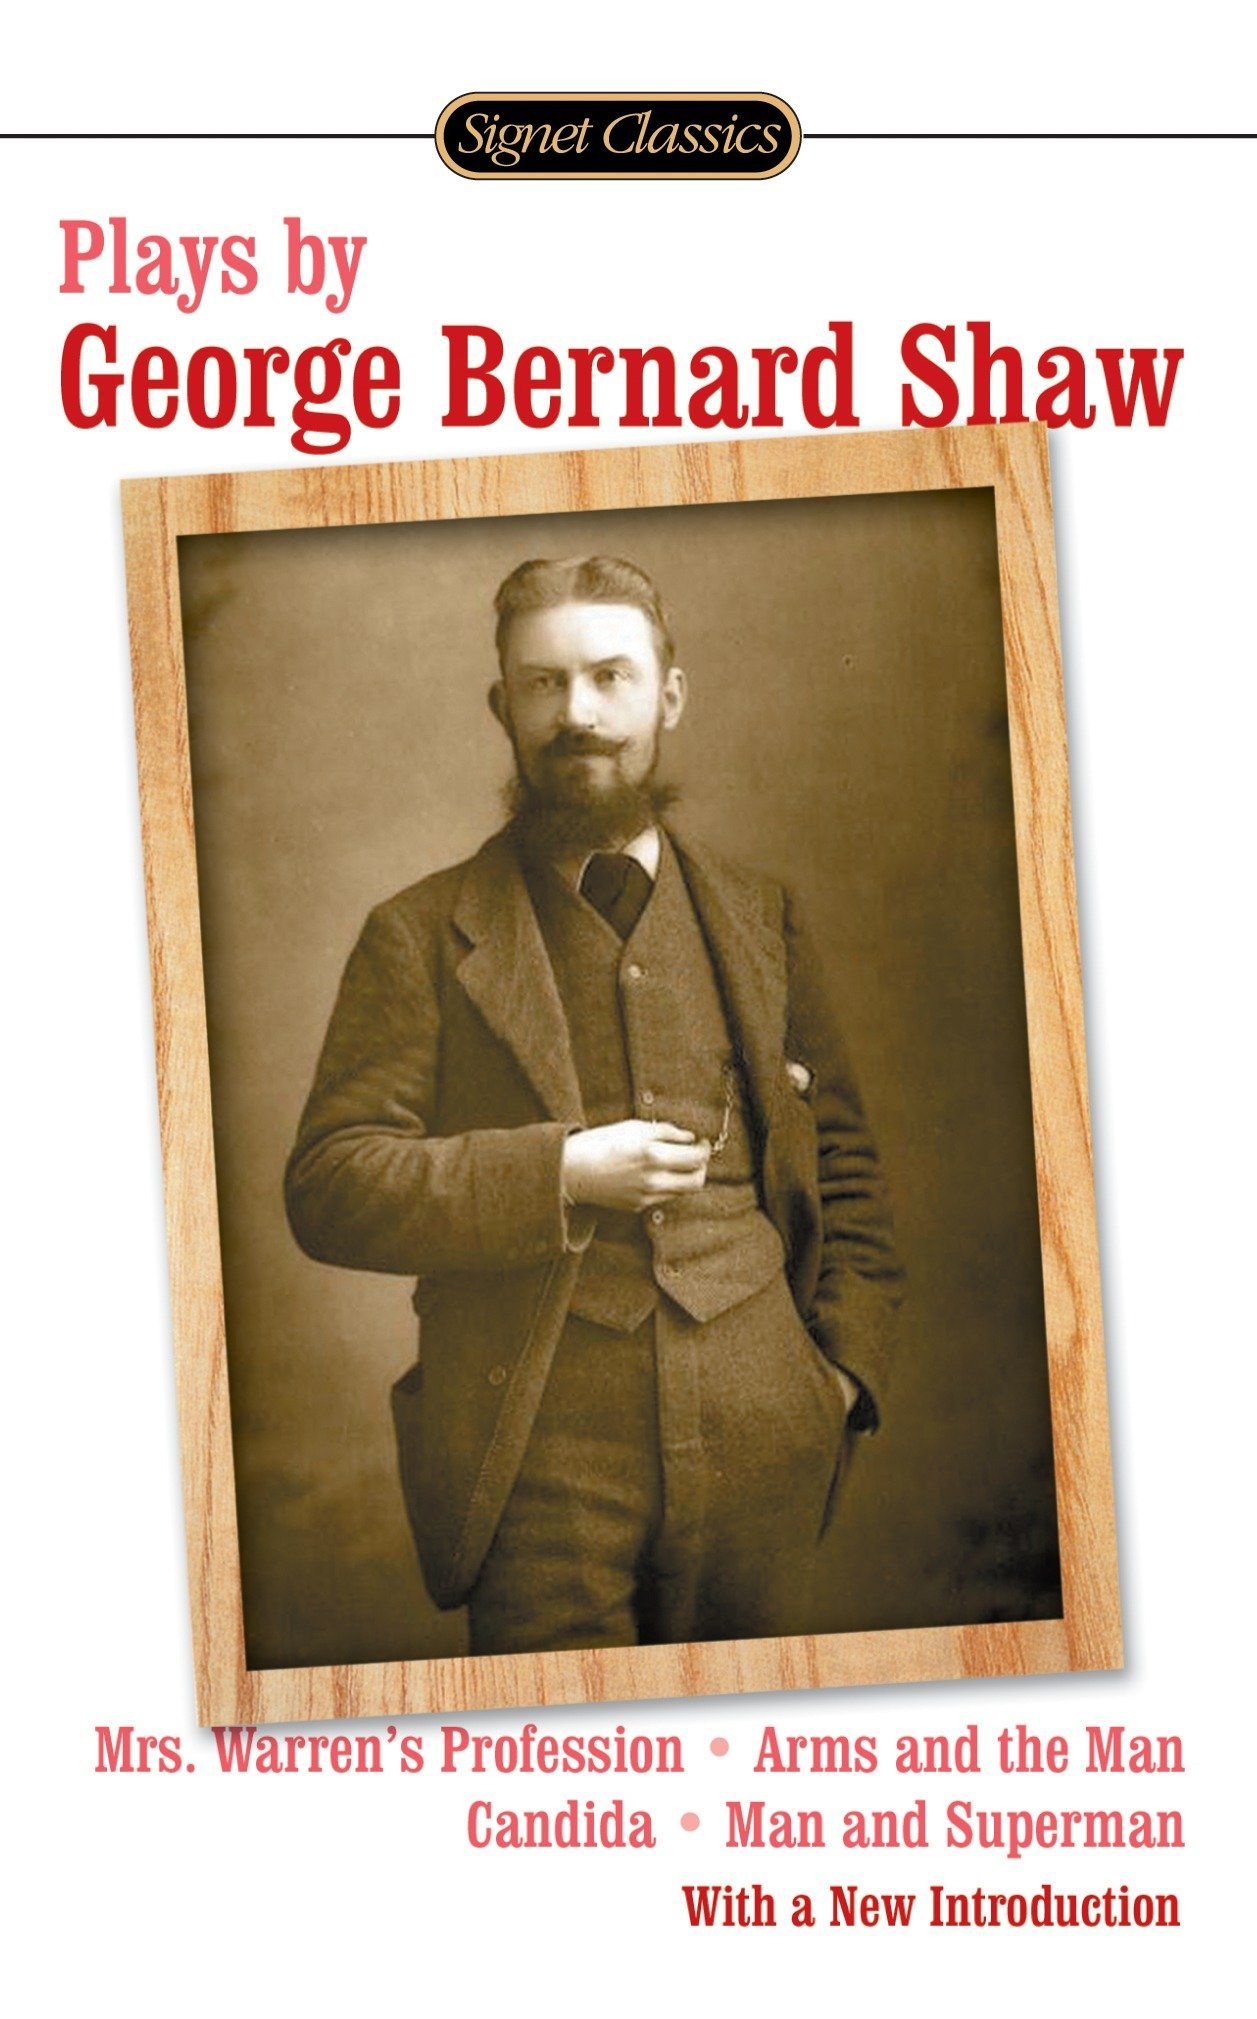 summary of the poem imagination by george bernard shaw